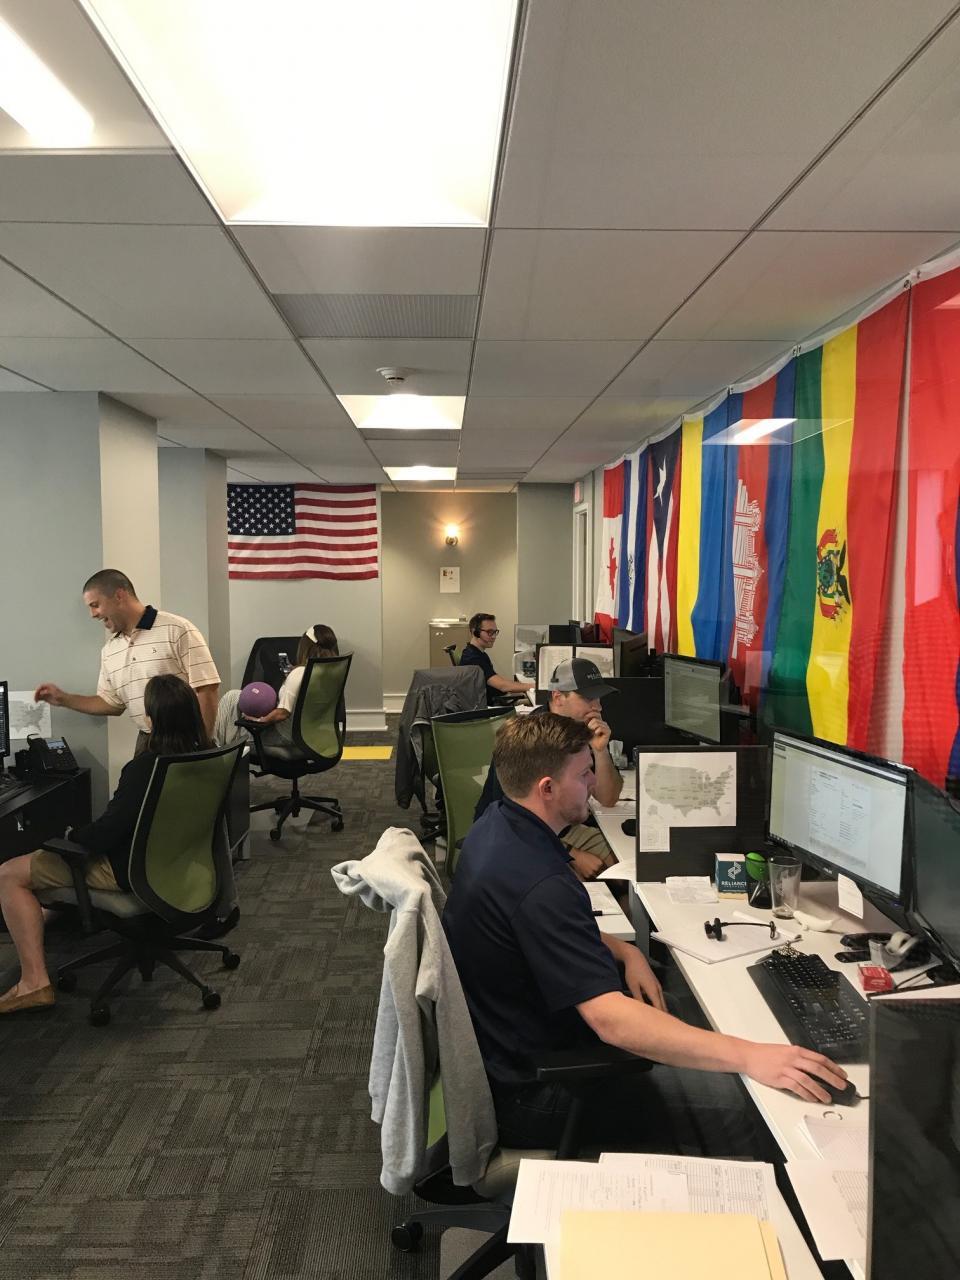 Reliance Partners Employee Photo